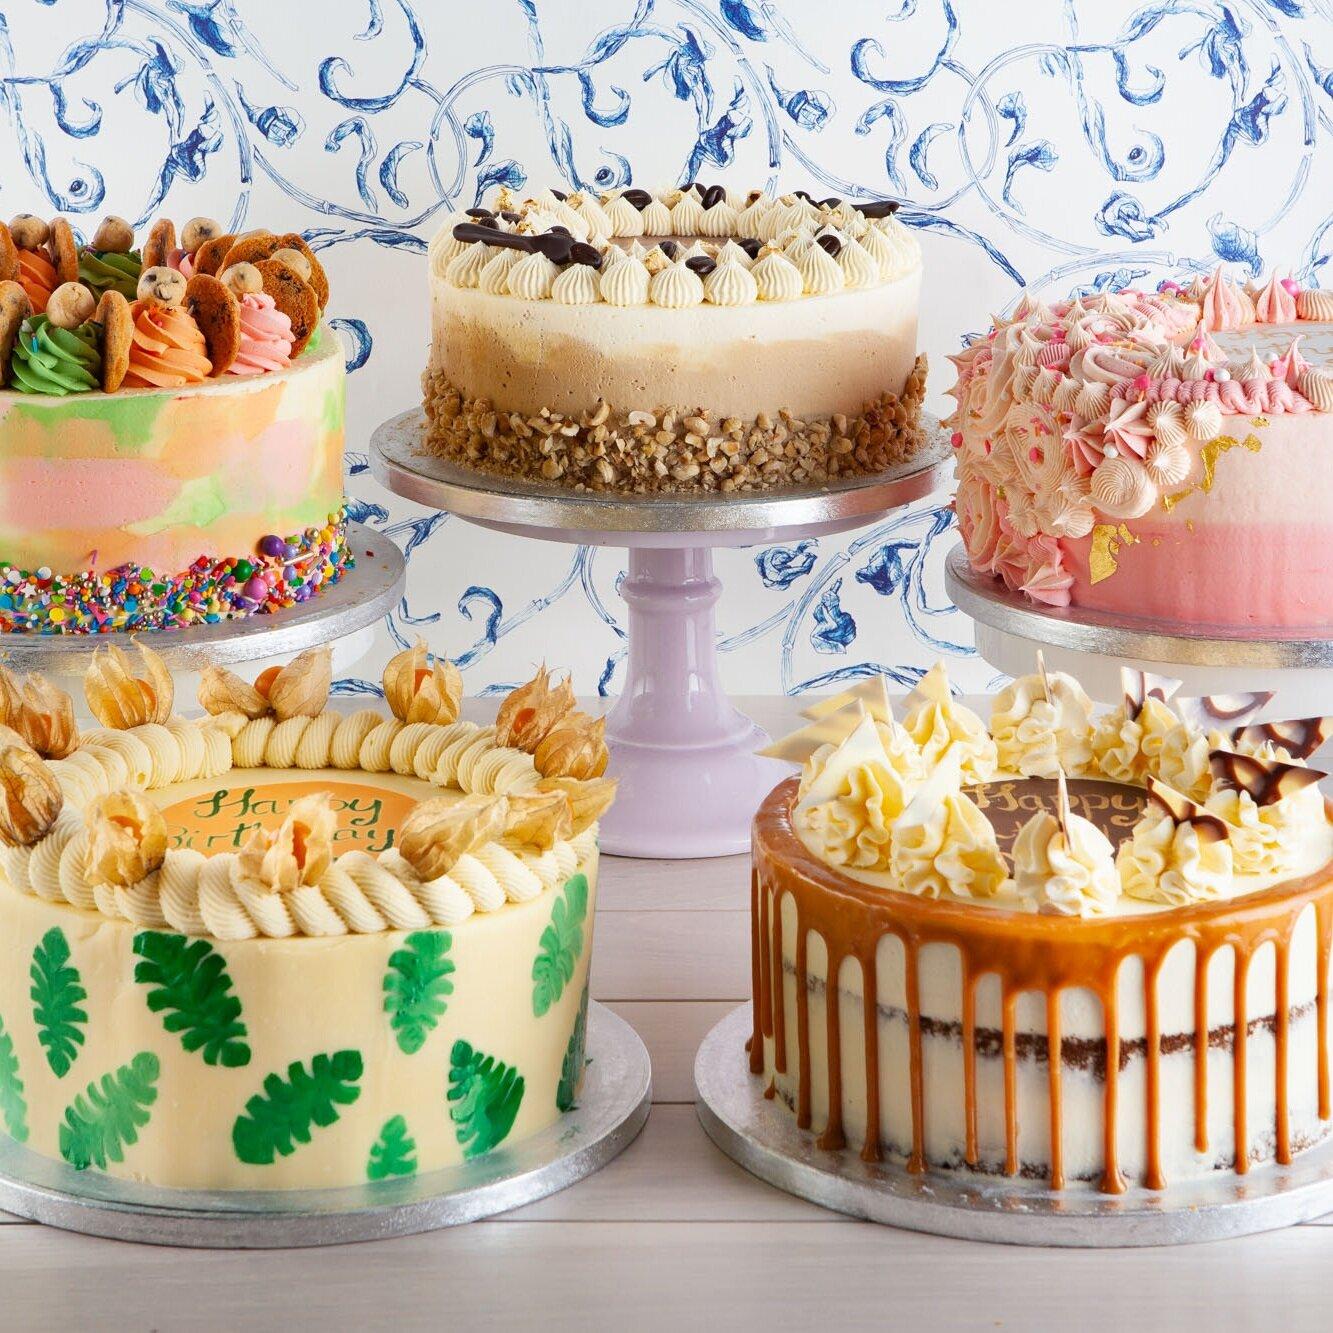 Celebration Cakes - Explore the range